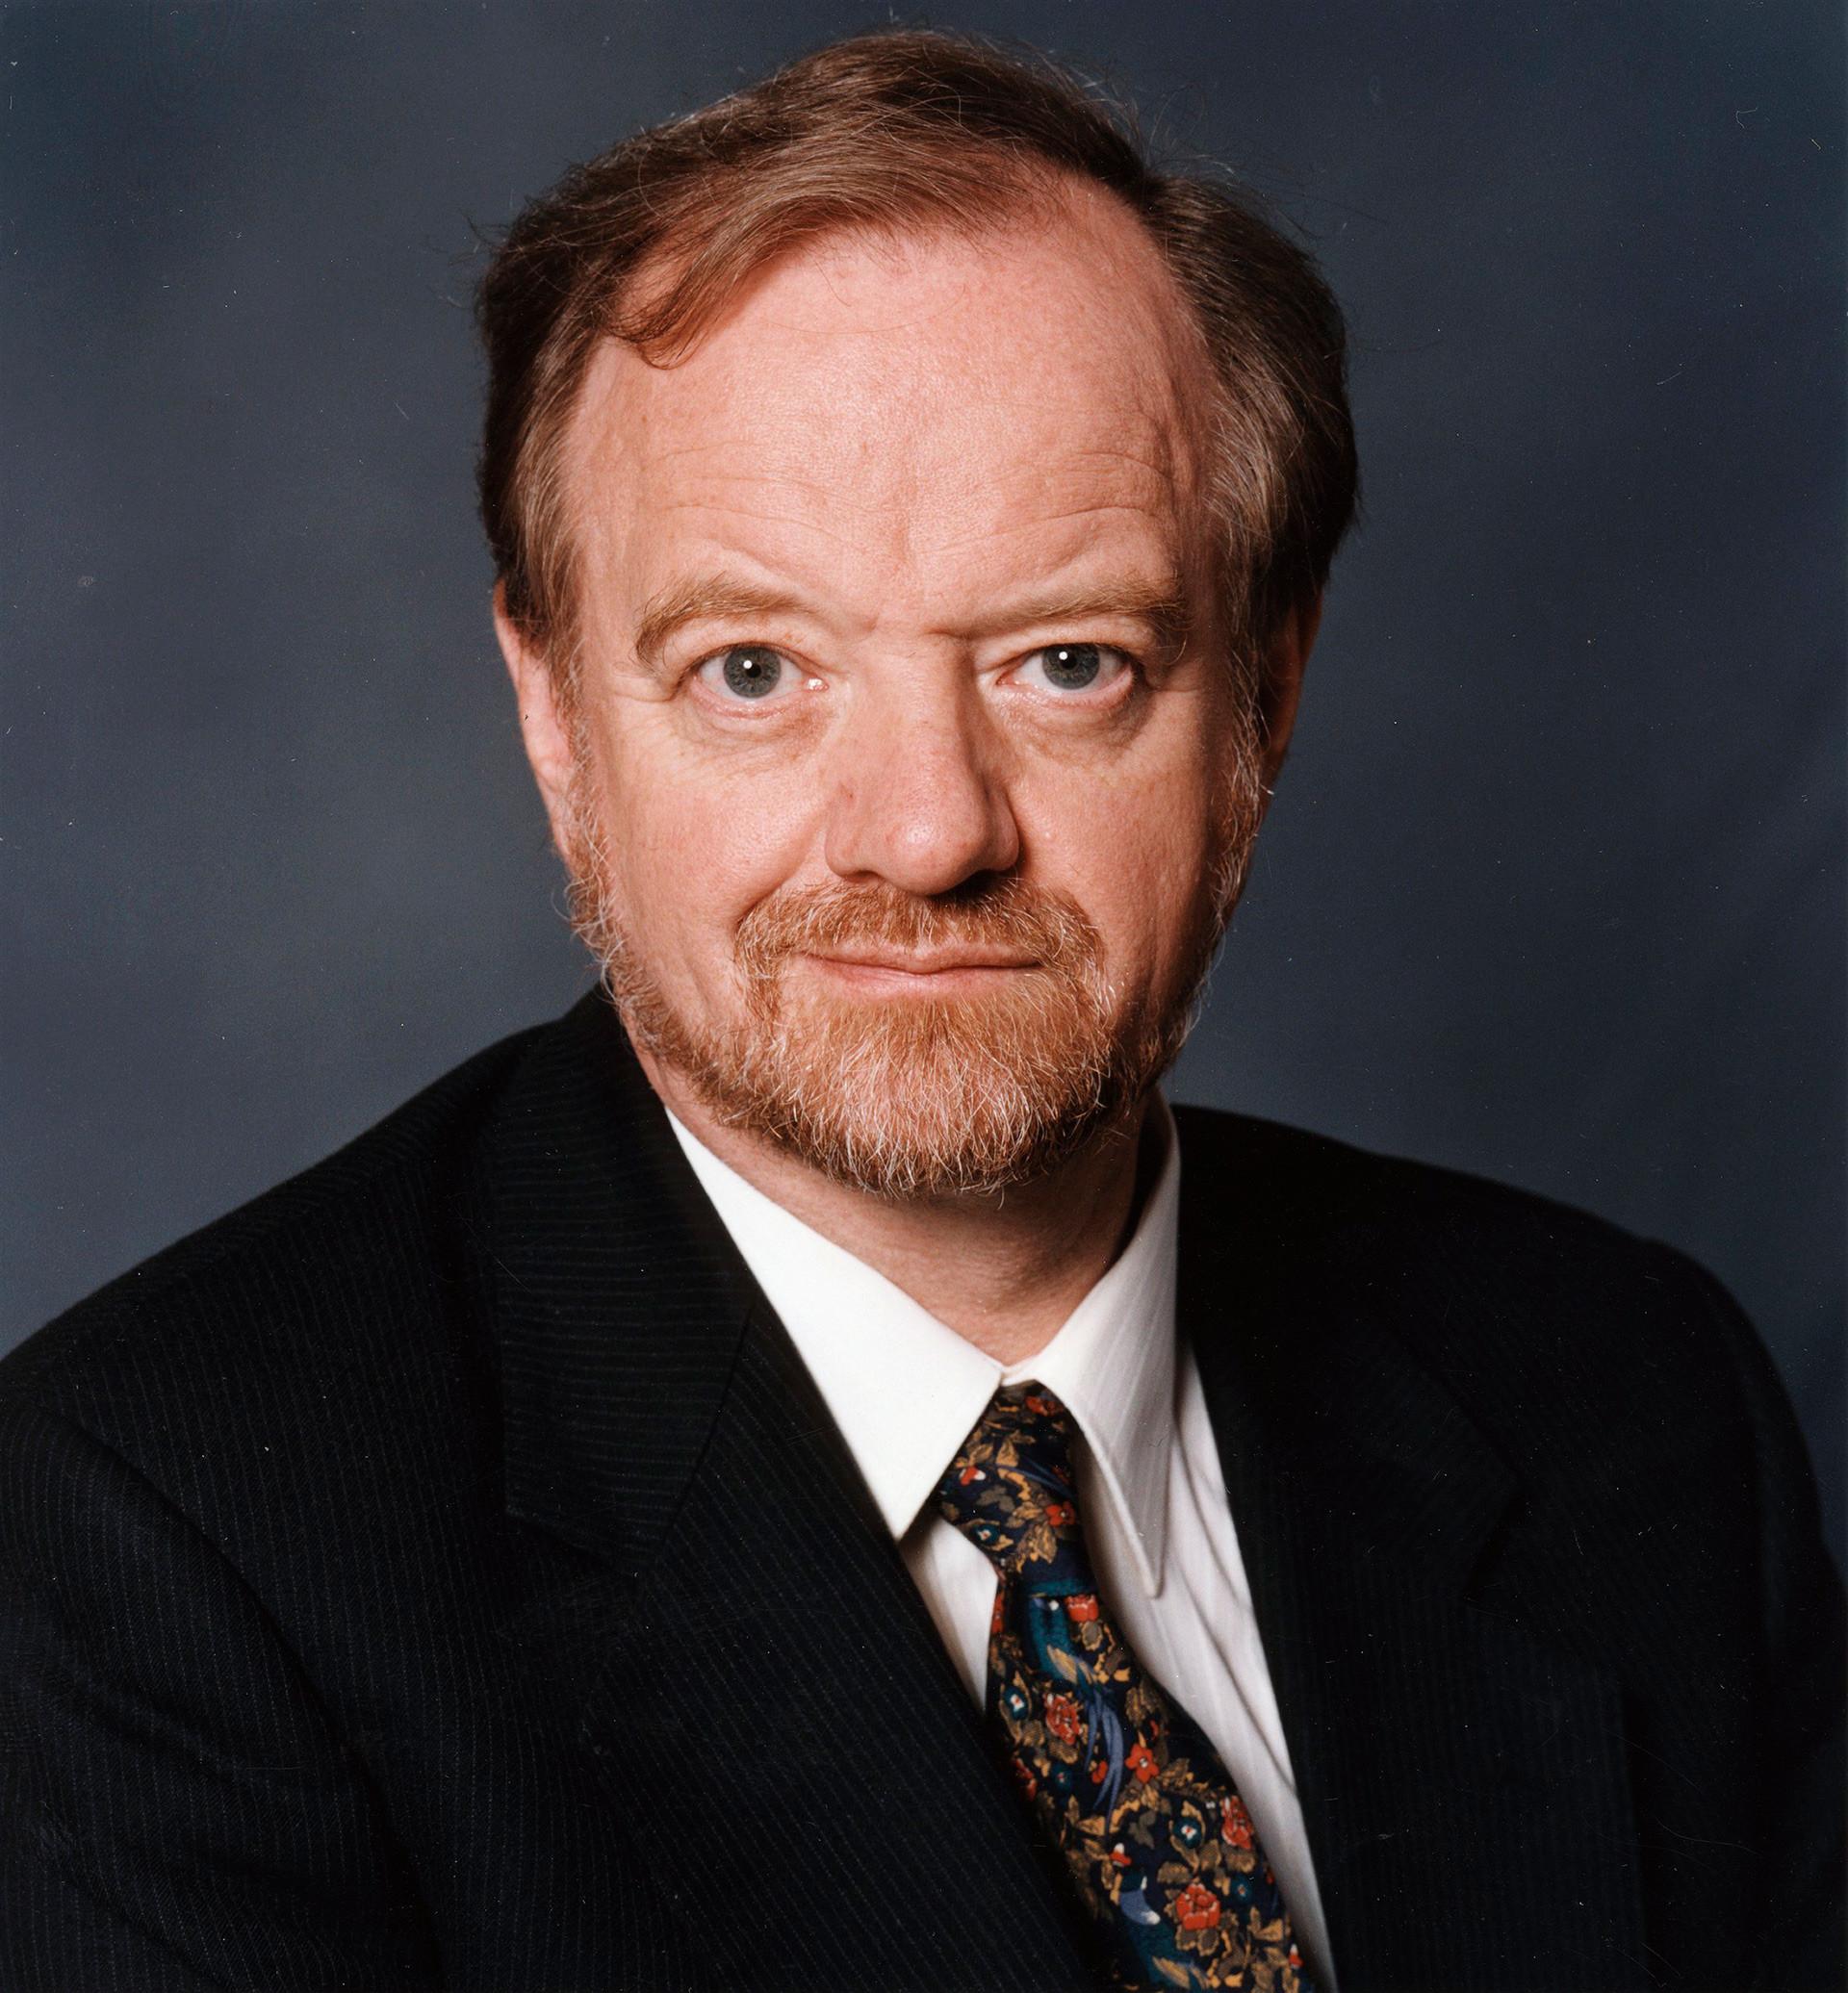 Robin Cook